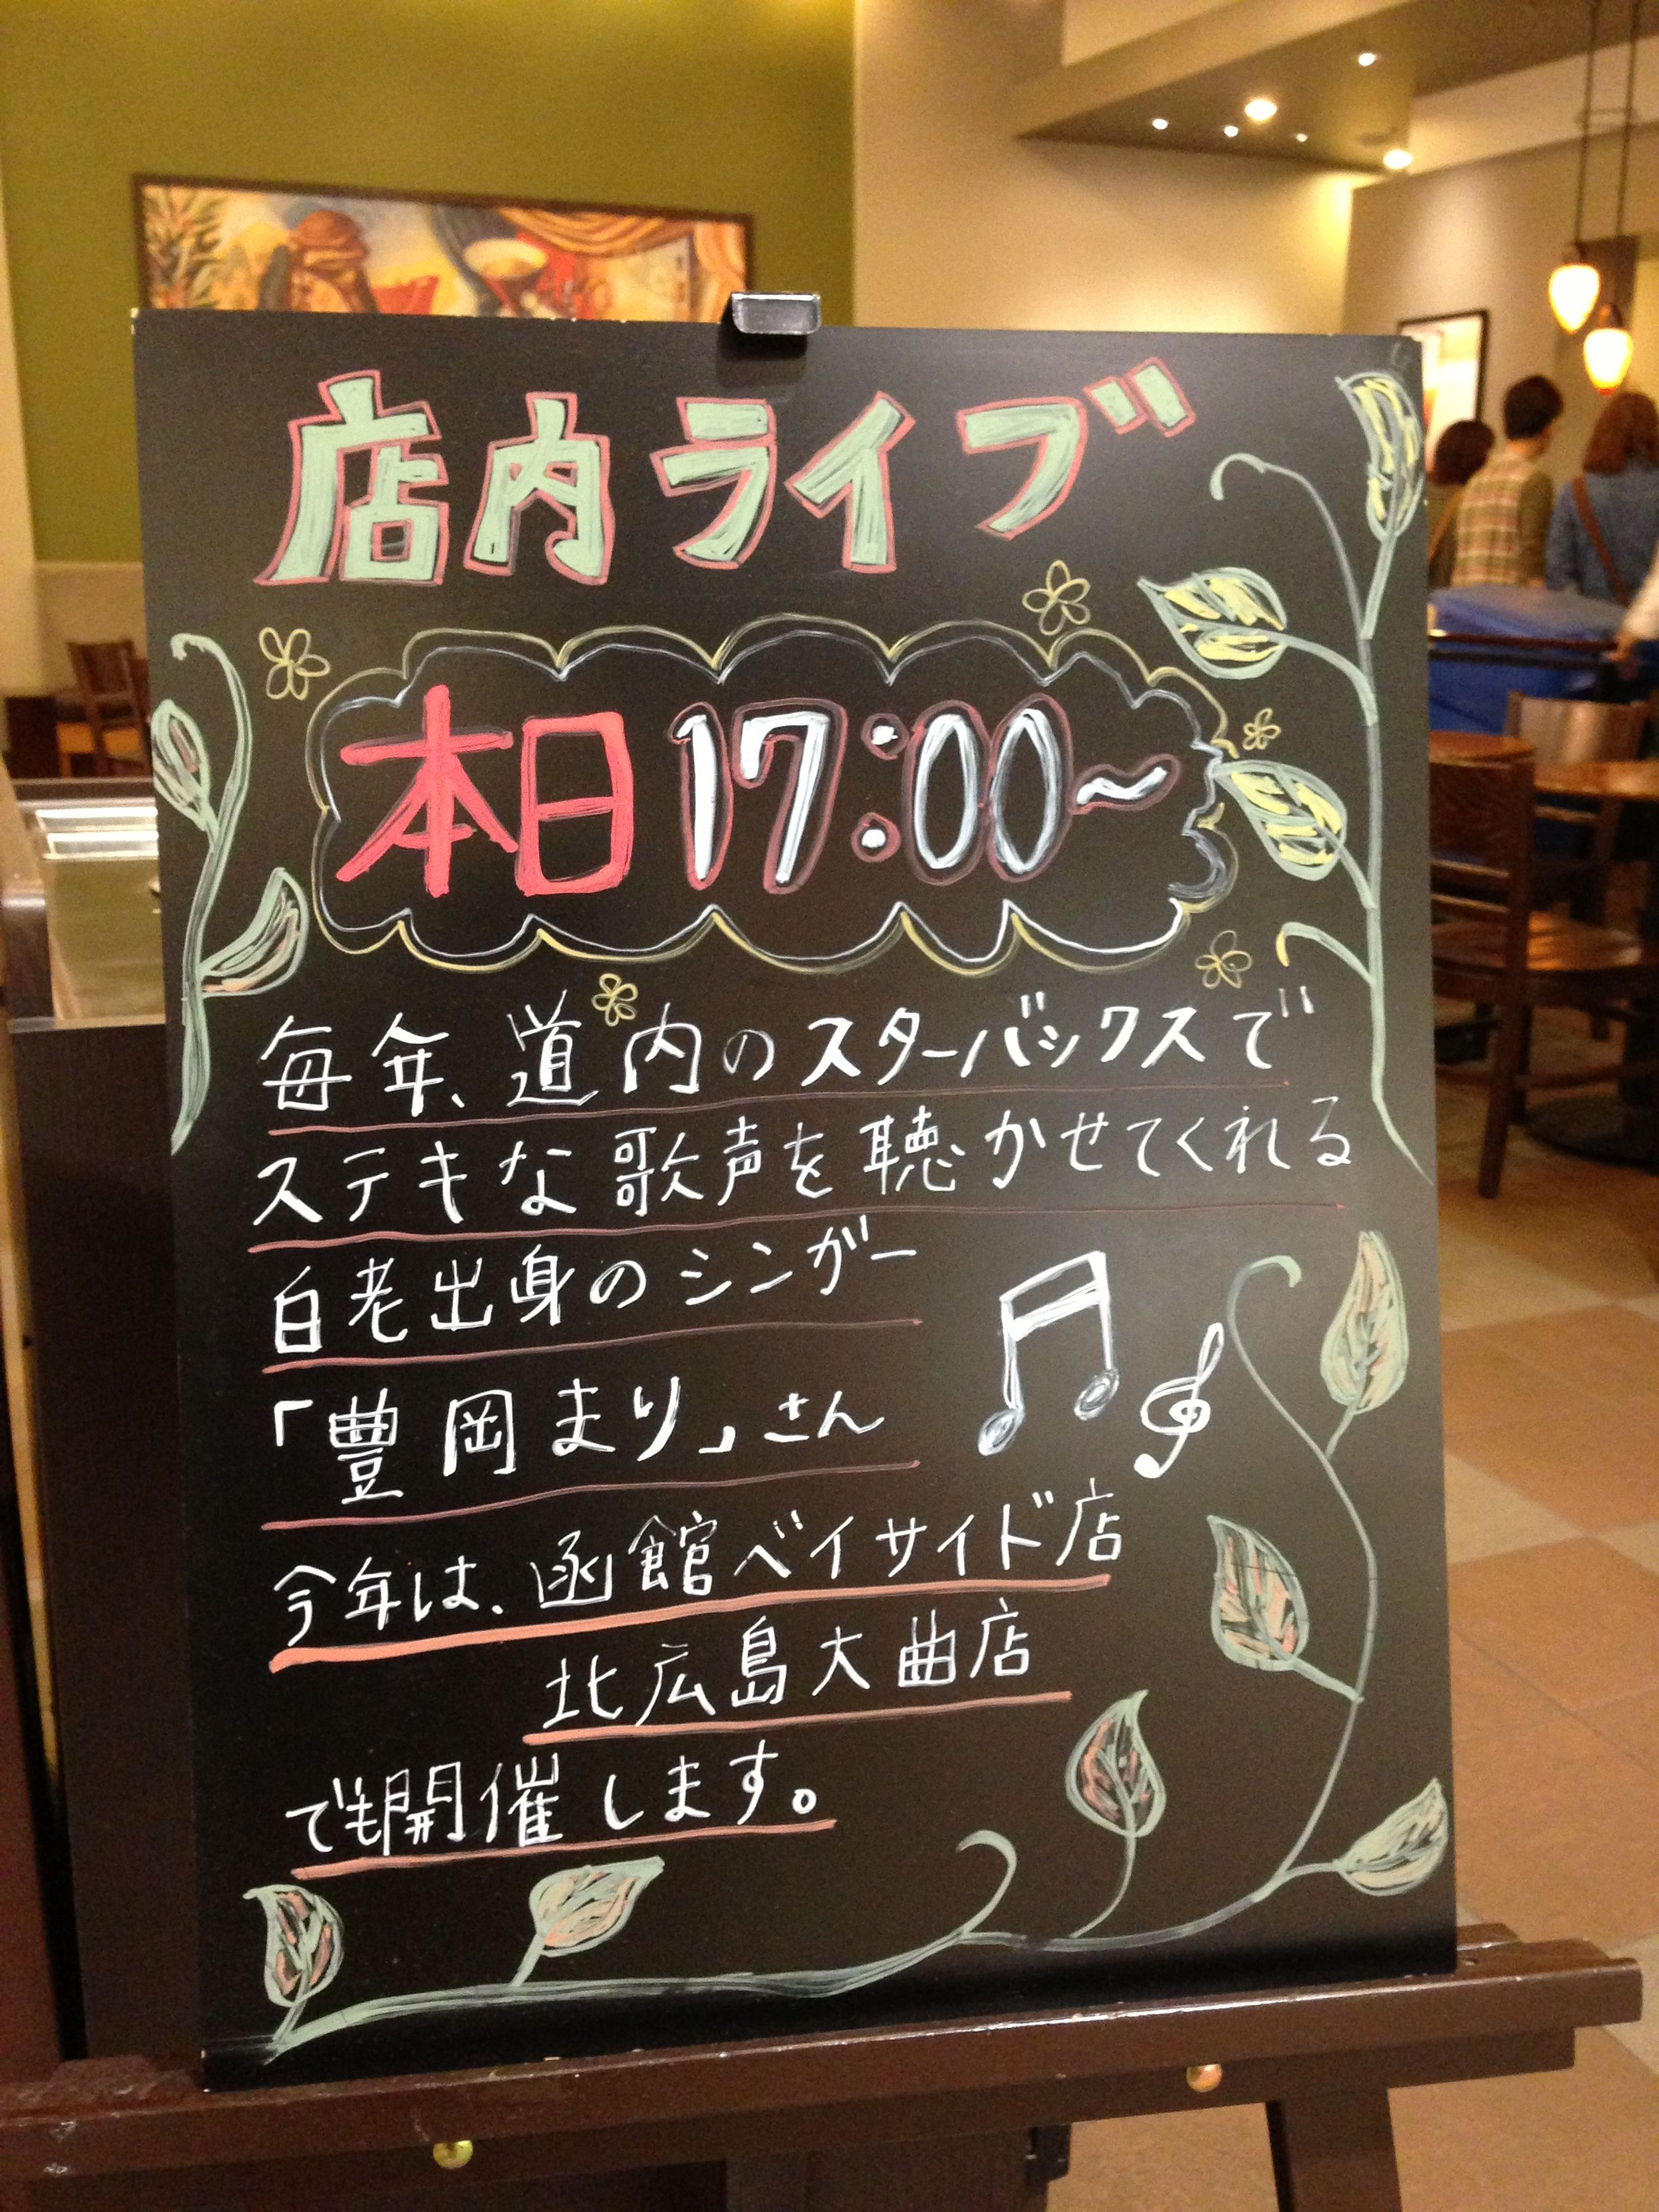 Jazz live at Tomakomai Starbucks Art quotes, Starbucks